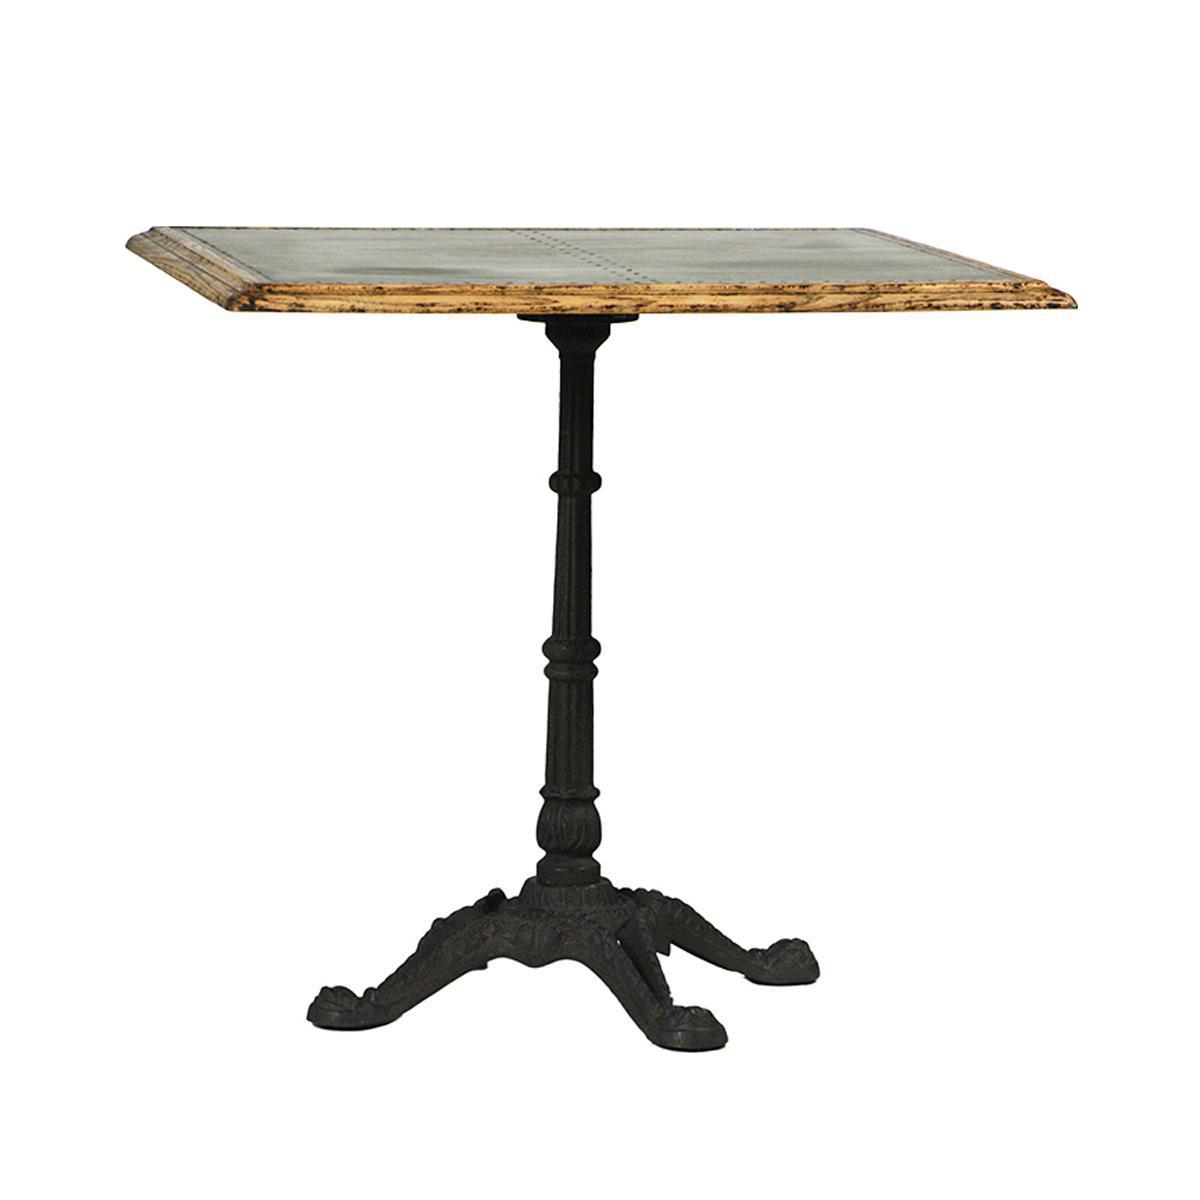 Charmant Zinc Square Bistro Table